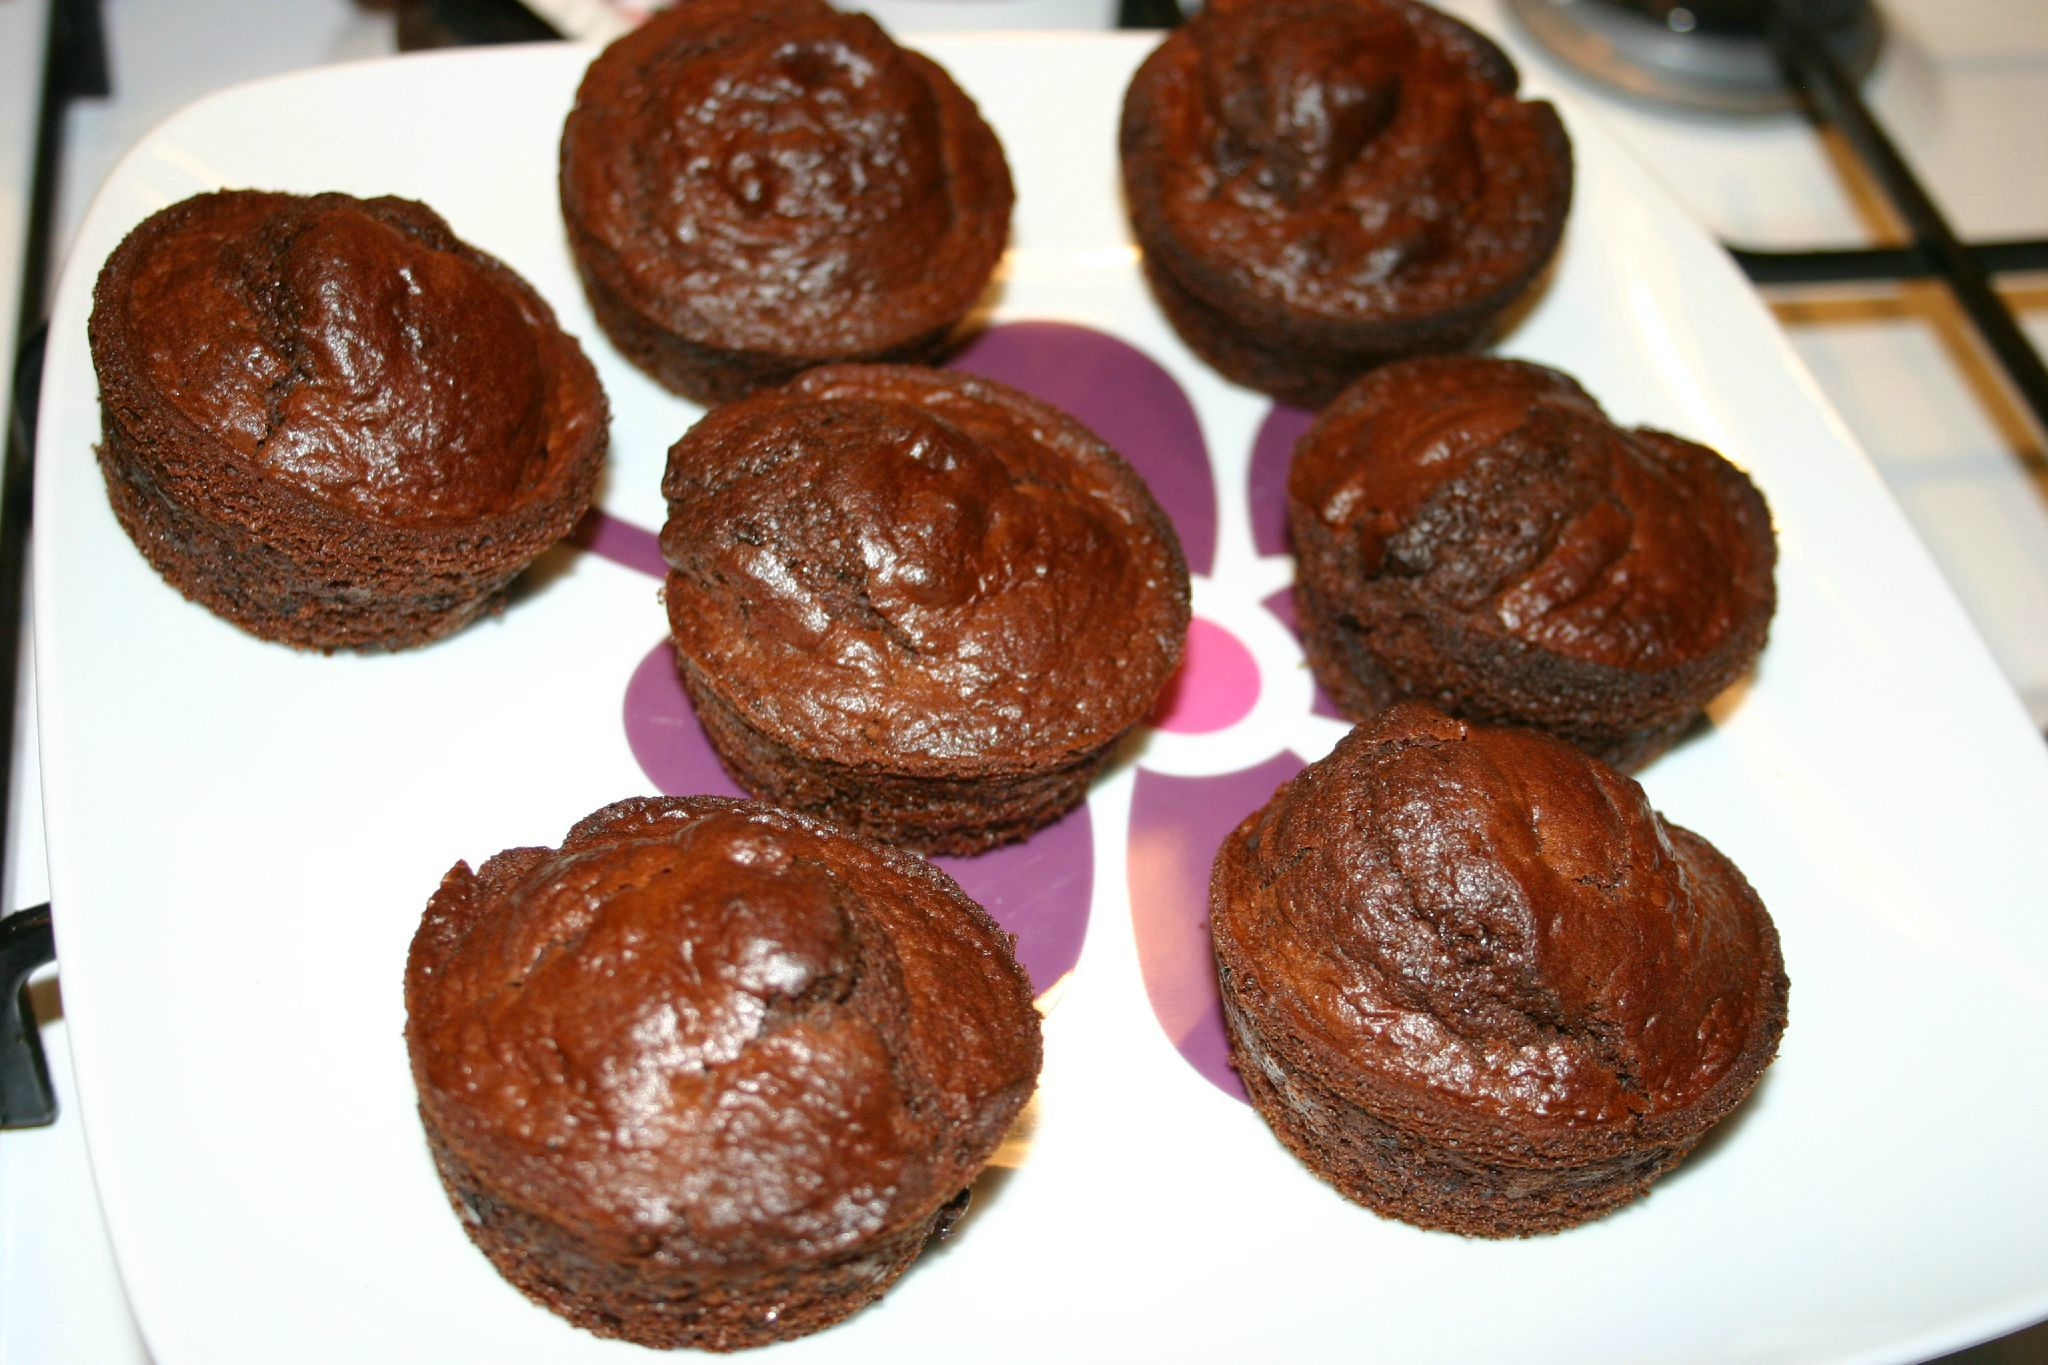 Muffins choco-pépit choco-caramel de Cam et Drey